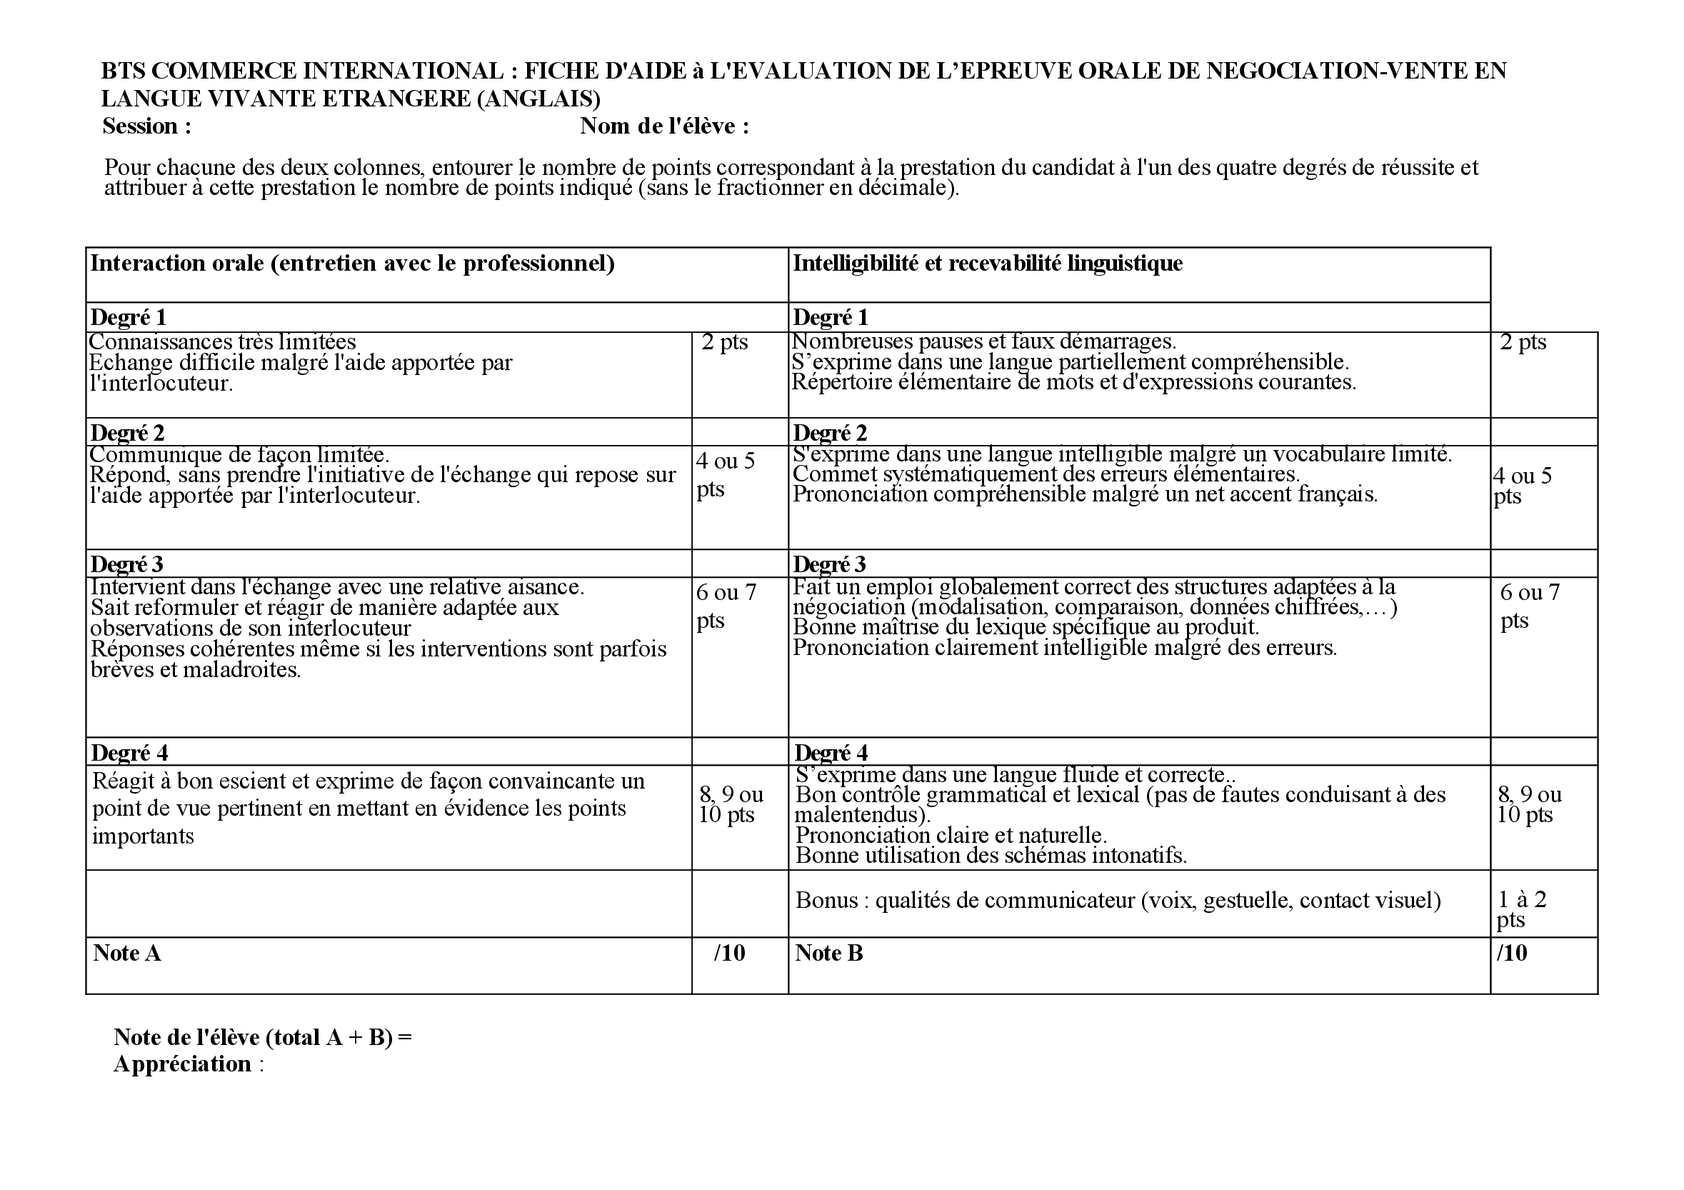 Calam o grille oral bts n gociation vente - Grille evaluation expression ecrite anglais ...